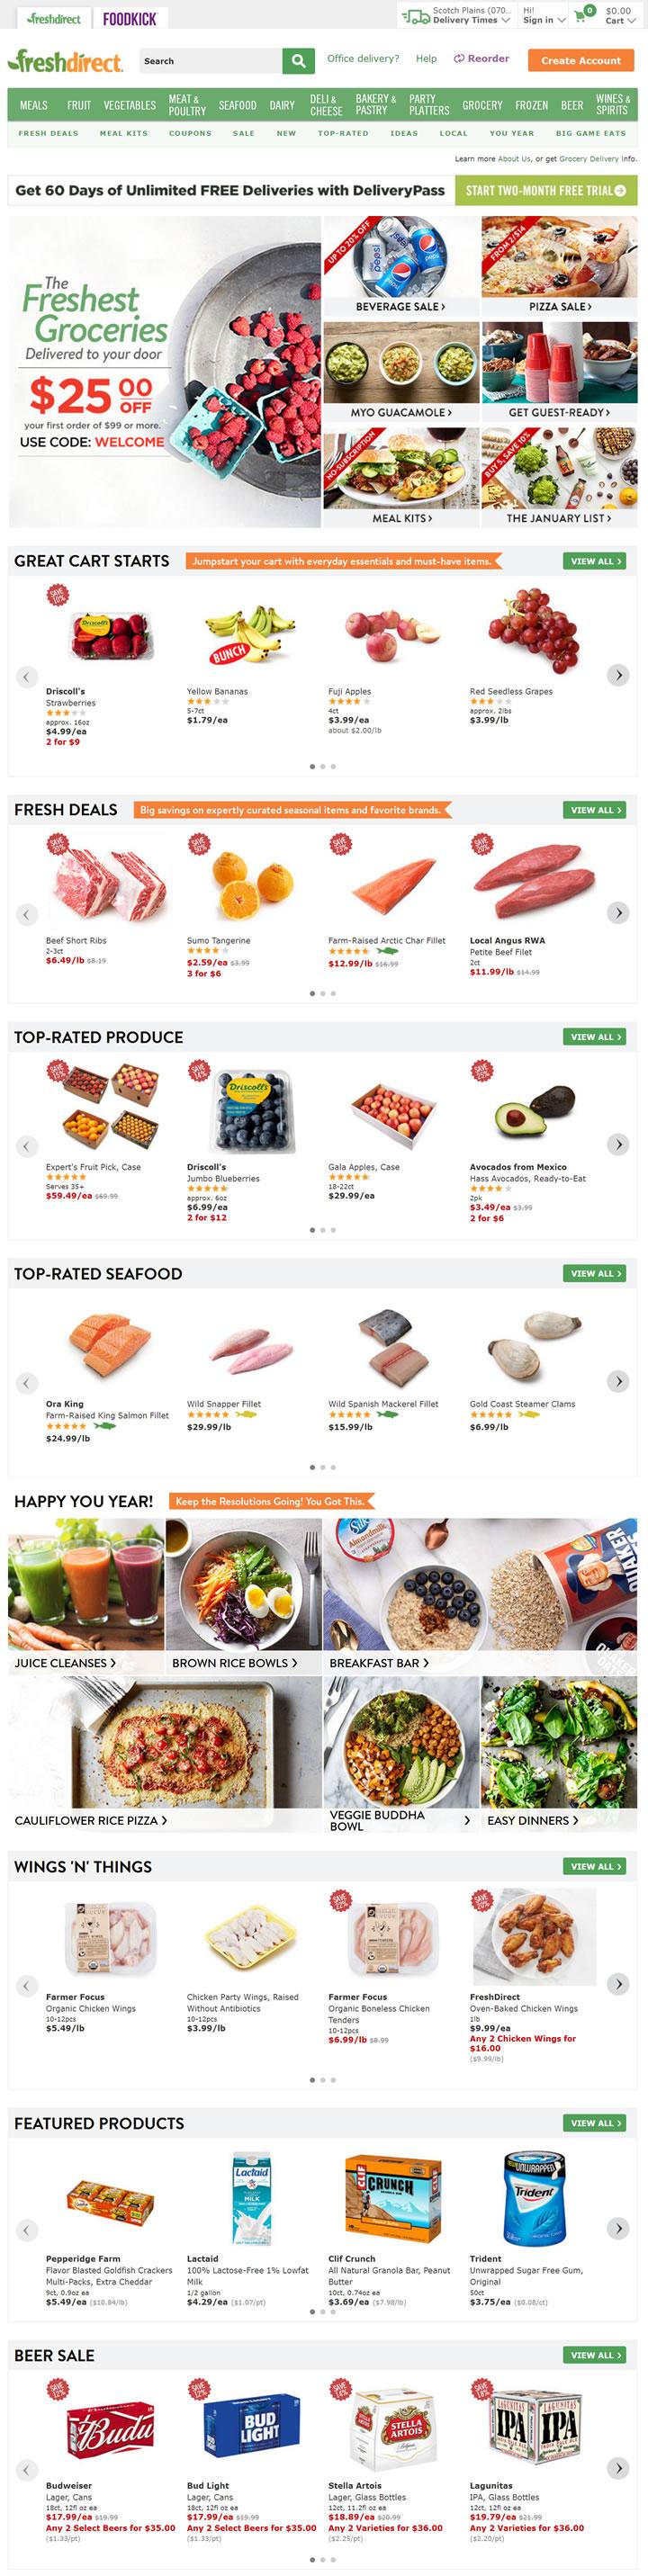 美国生鲜及杂货电商:FreshDirect